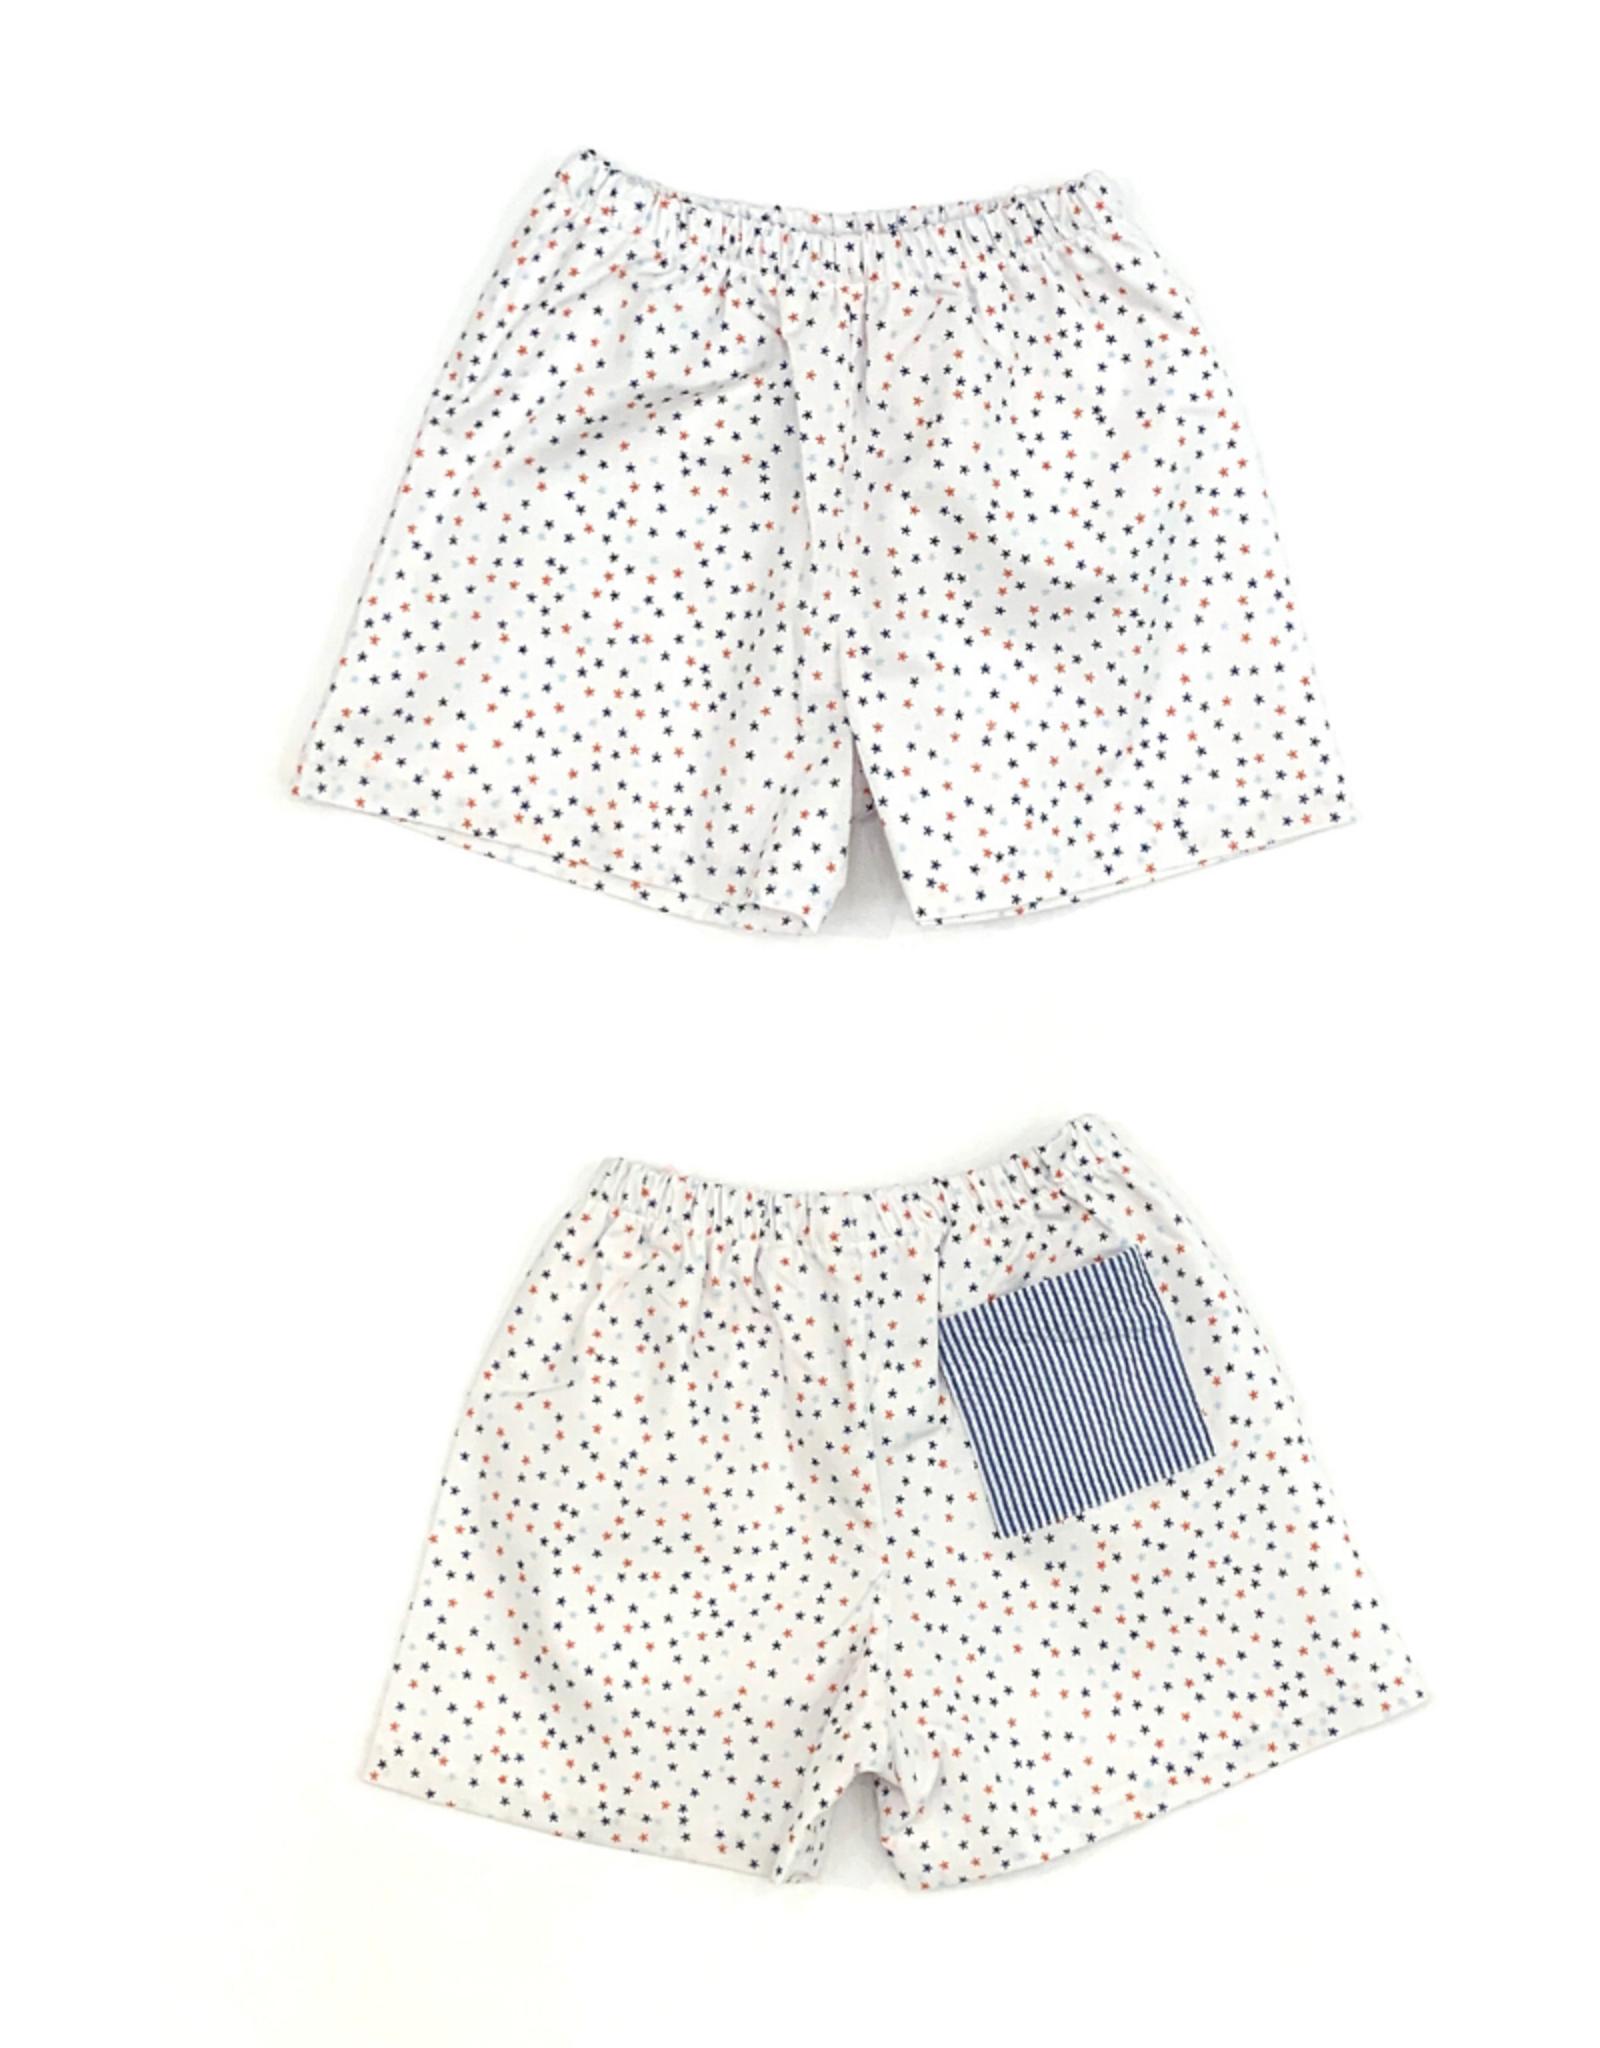 James and Lottie Conrad Starfish Shorts